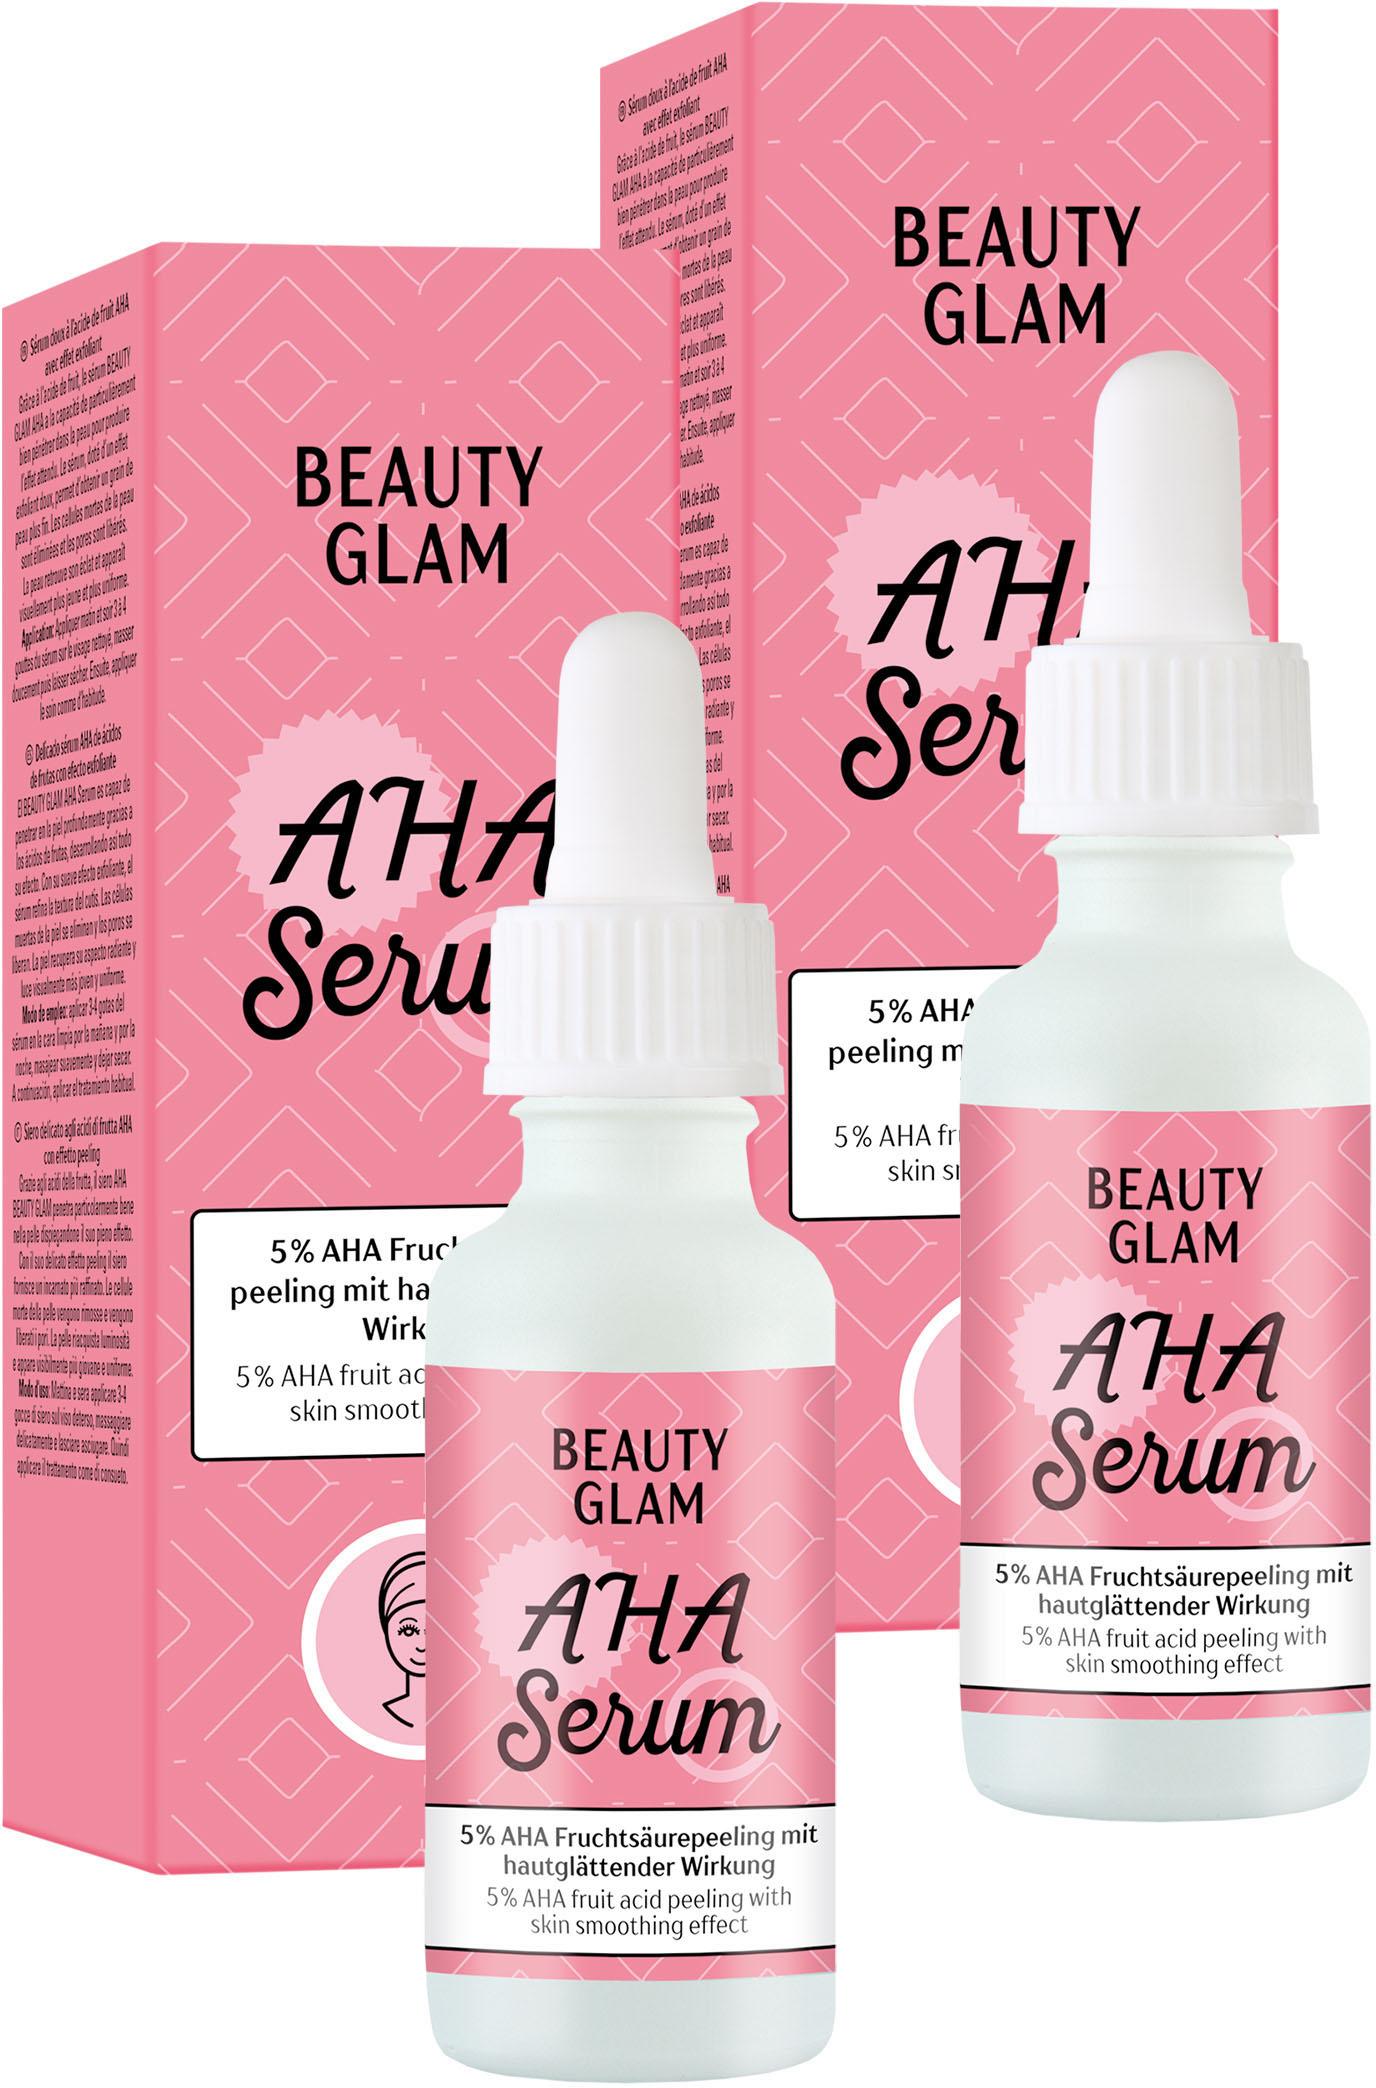 beauty glam -  Gesichtspflege-Set AHA Serum, (2 tlg.)